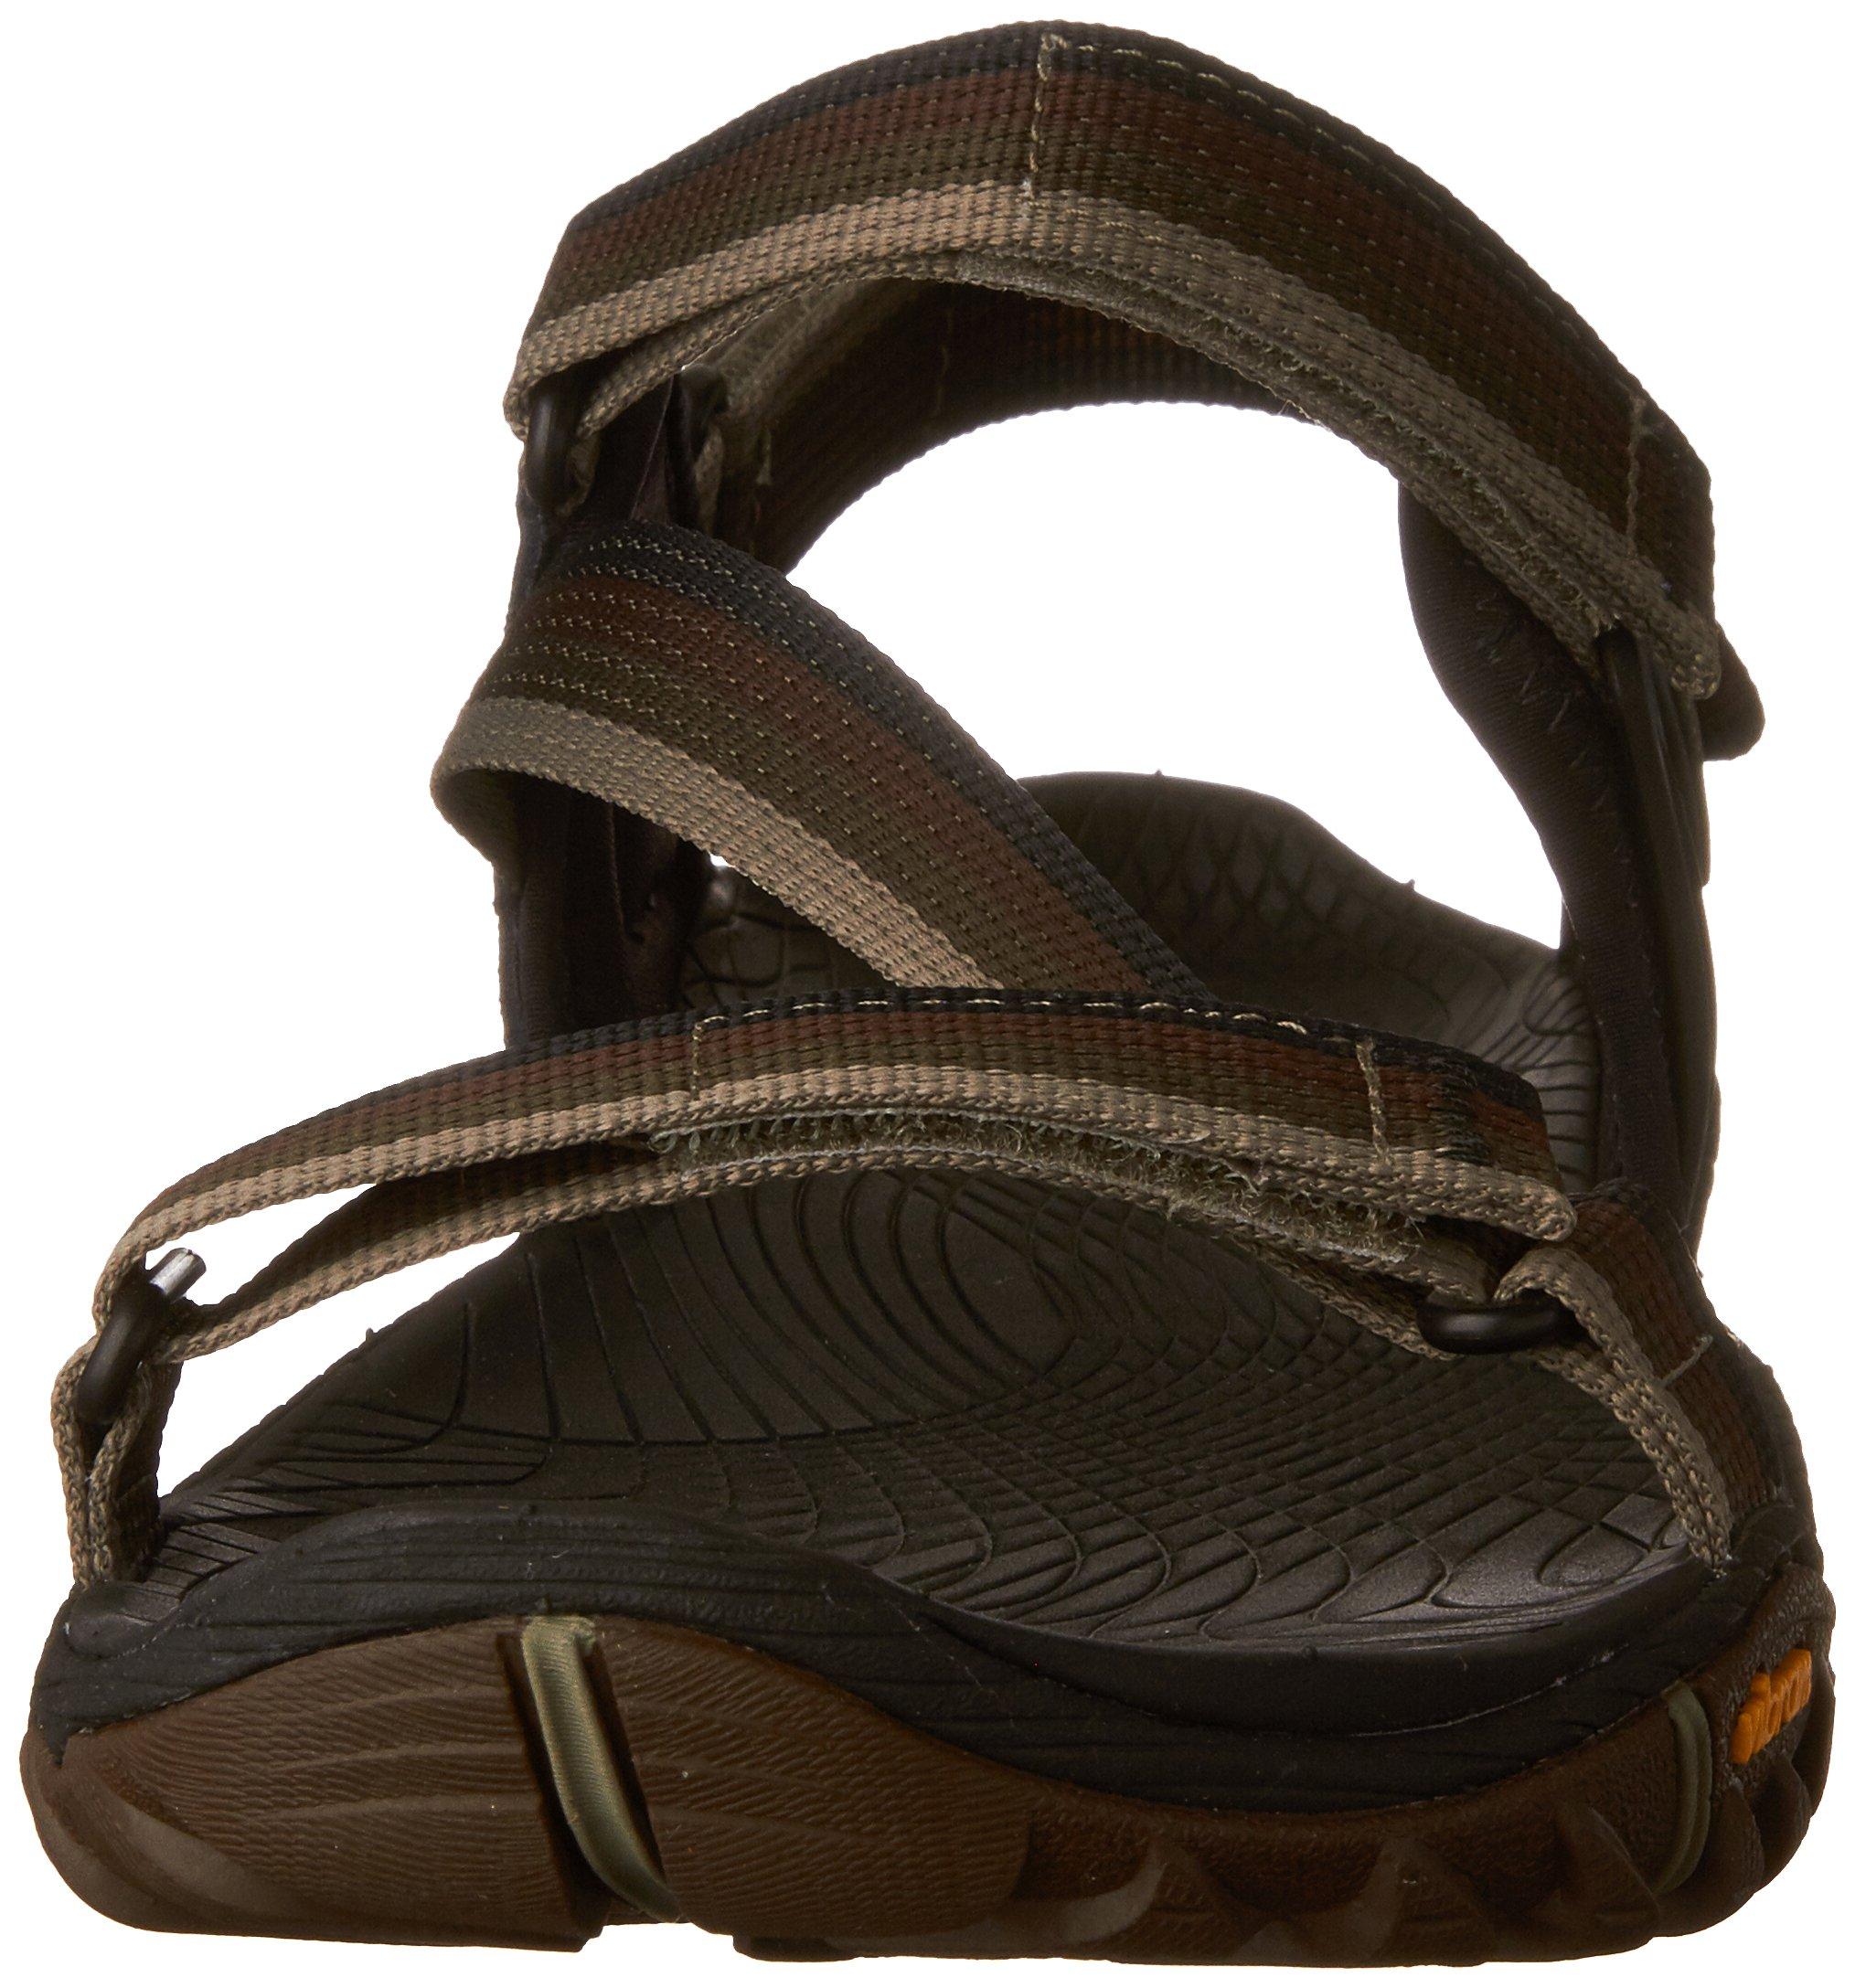 Merrell Men S All Out Blaze Web Hiking Shoe Black Choose